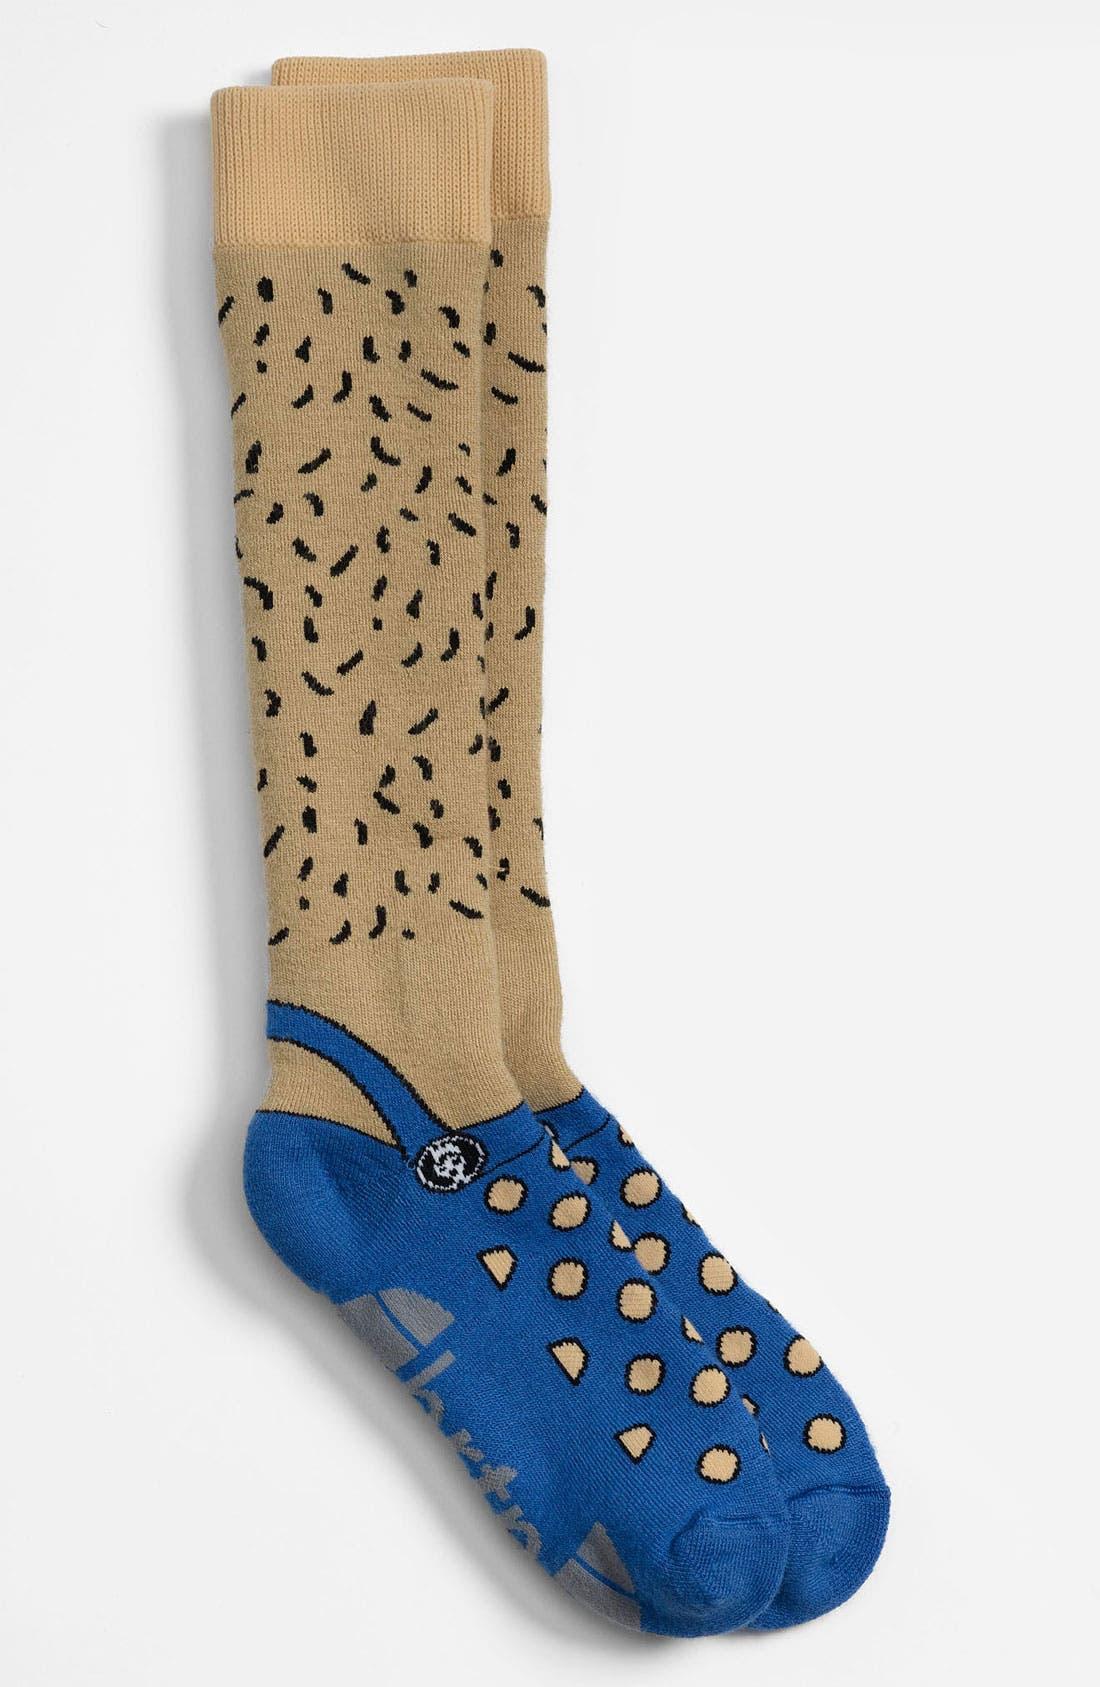 Alternate Image 1 Selected - Burton 'Party' Socks